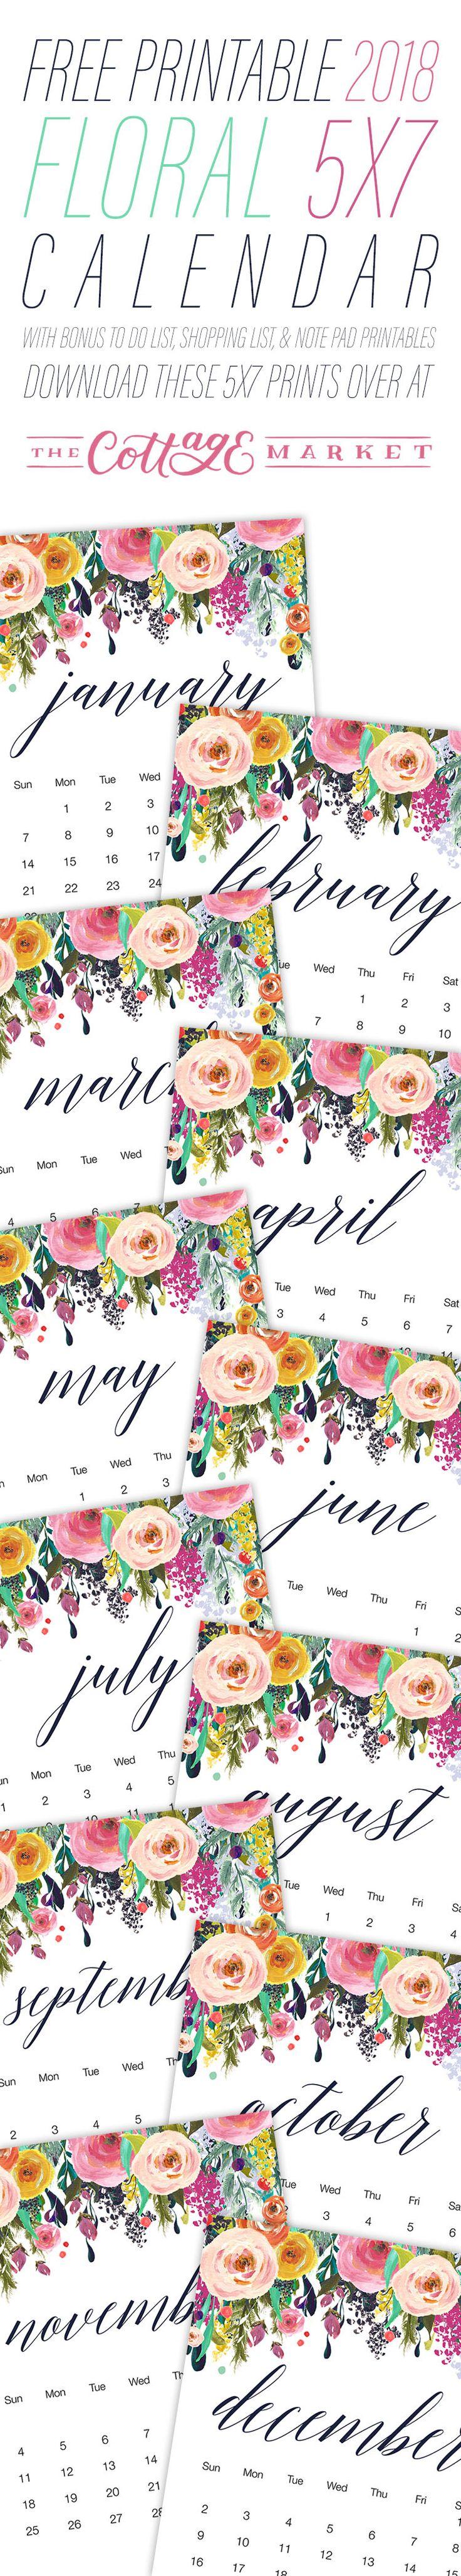 Free Printable 2018 Floral 5×7 Calendar